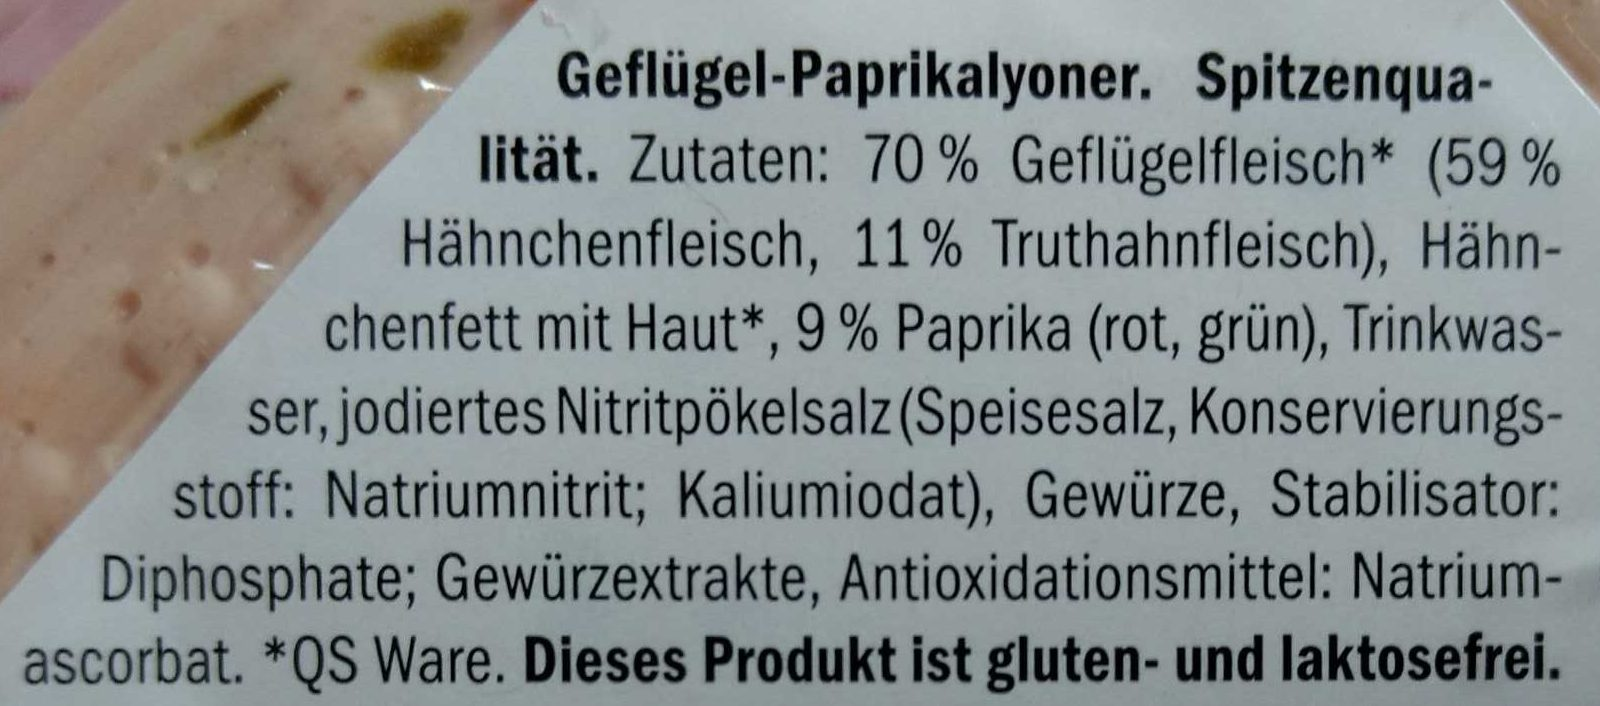 Geflügel Paprikalyoner - Zutaten - de